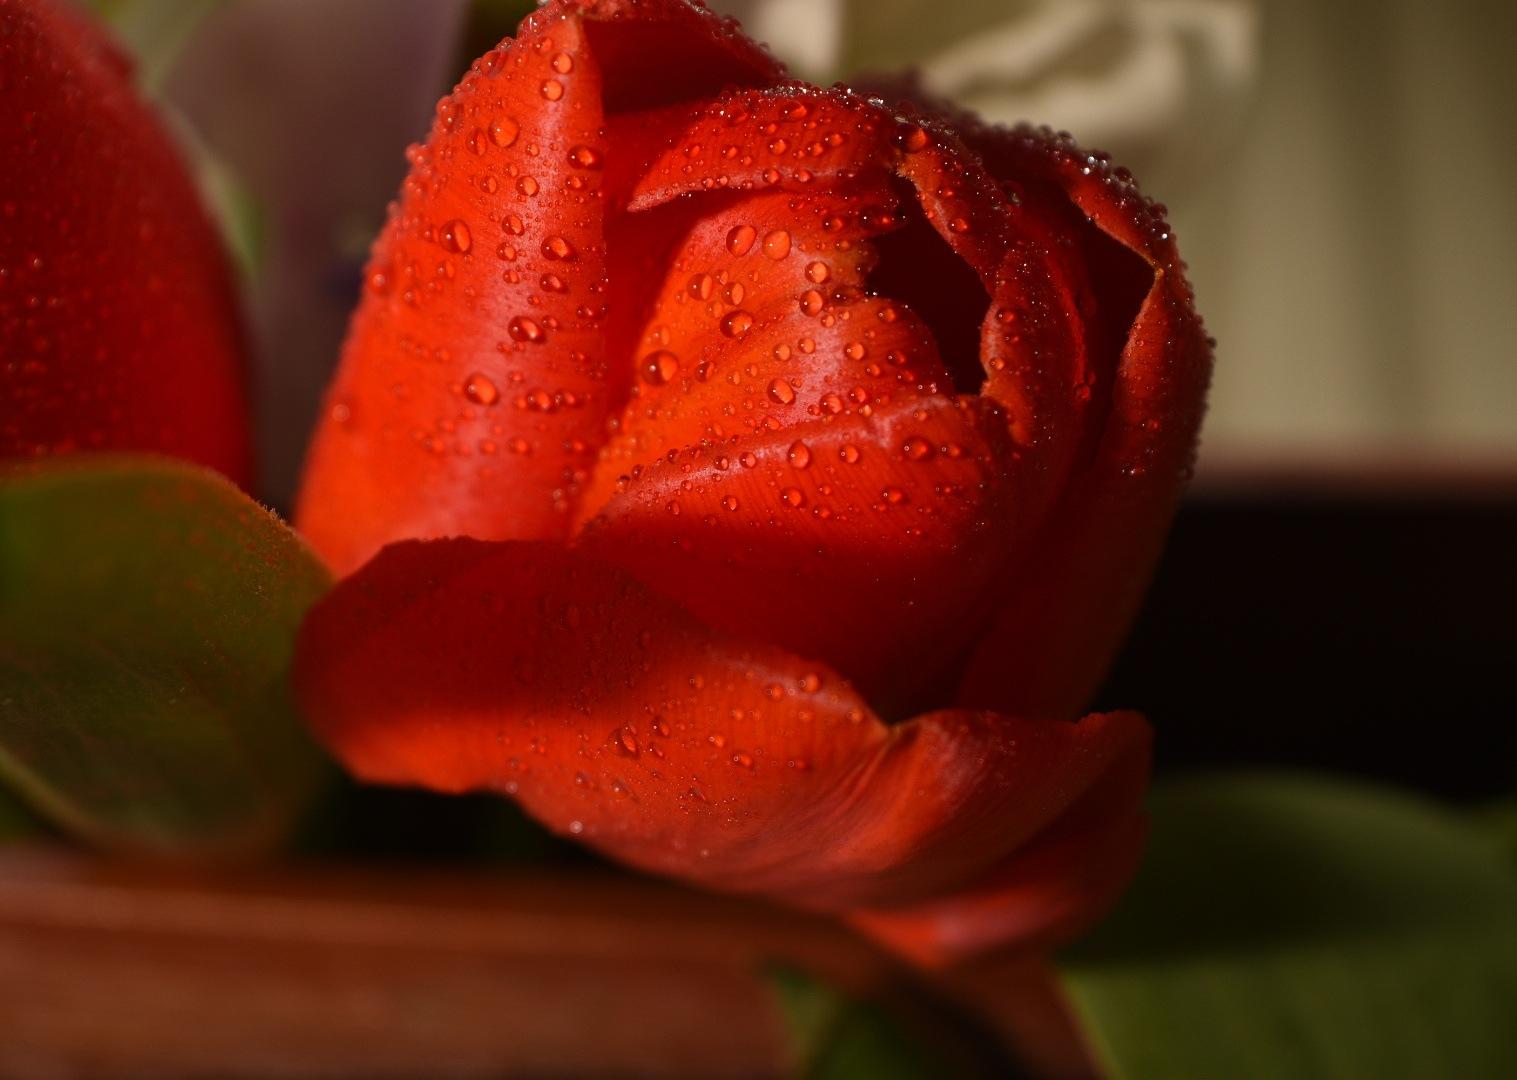 Red tulip by Toshio Sunada